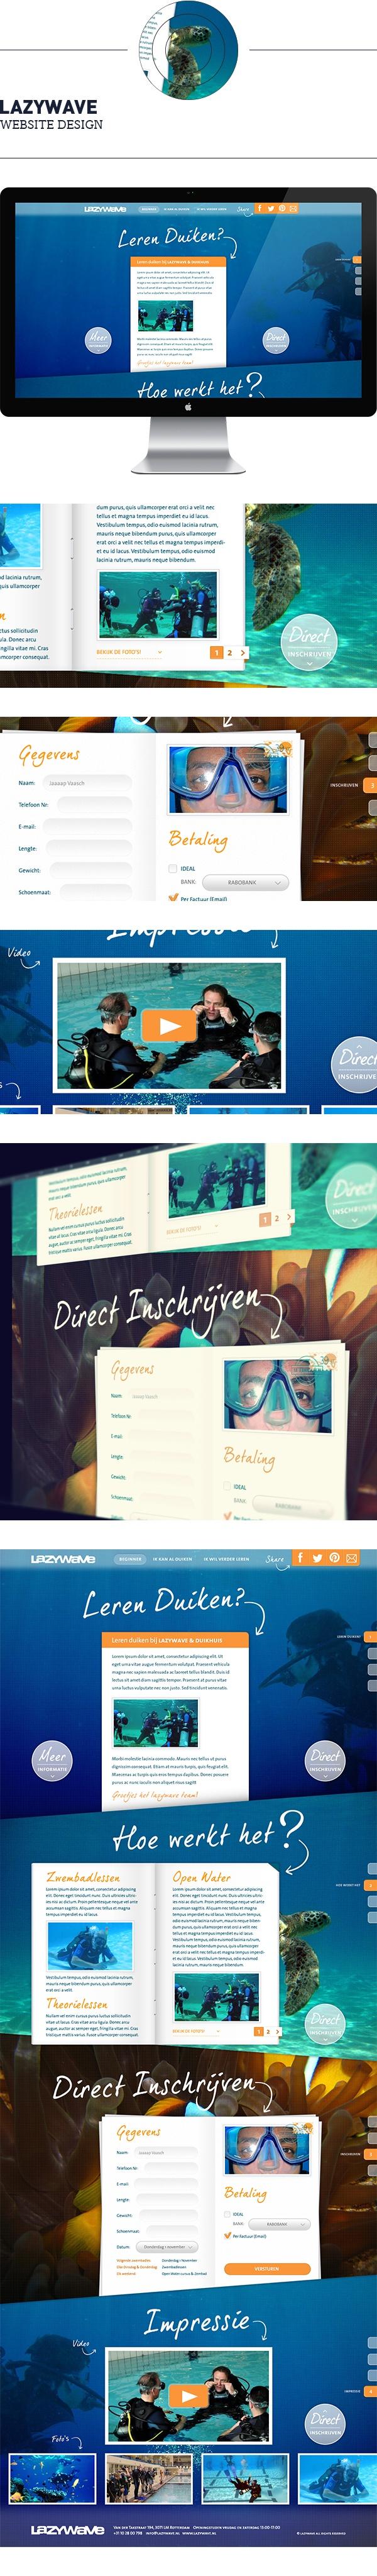 Lazywave - Duiklessen.nl on Behance